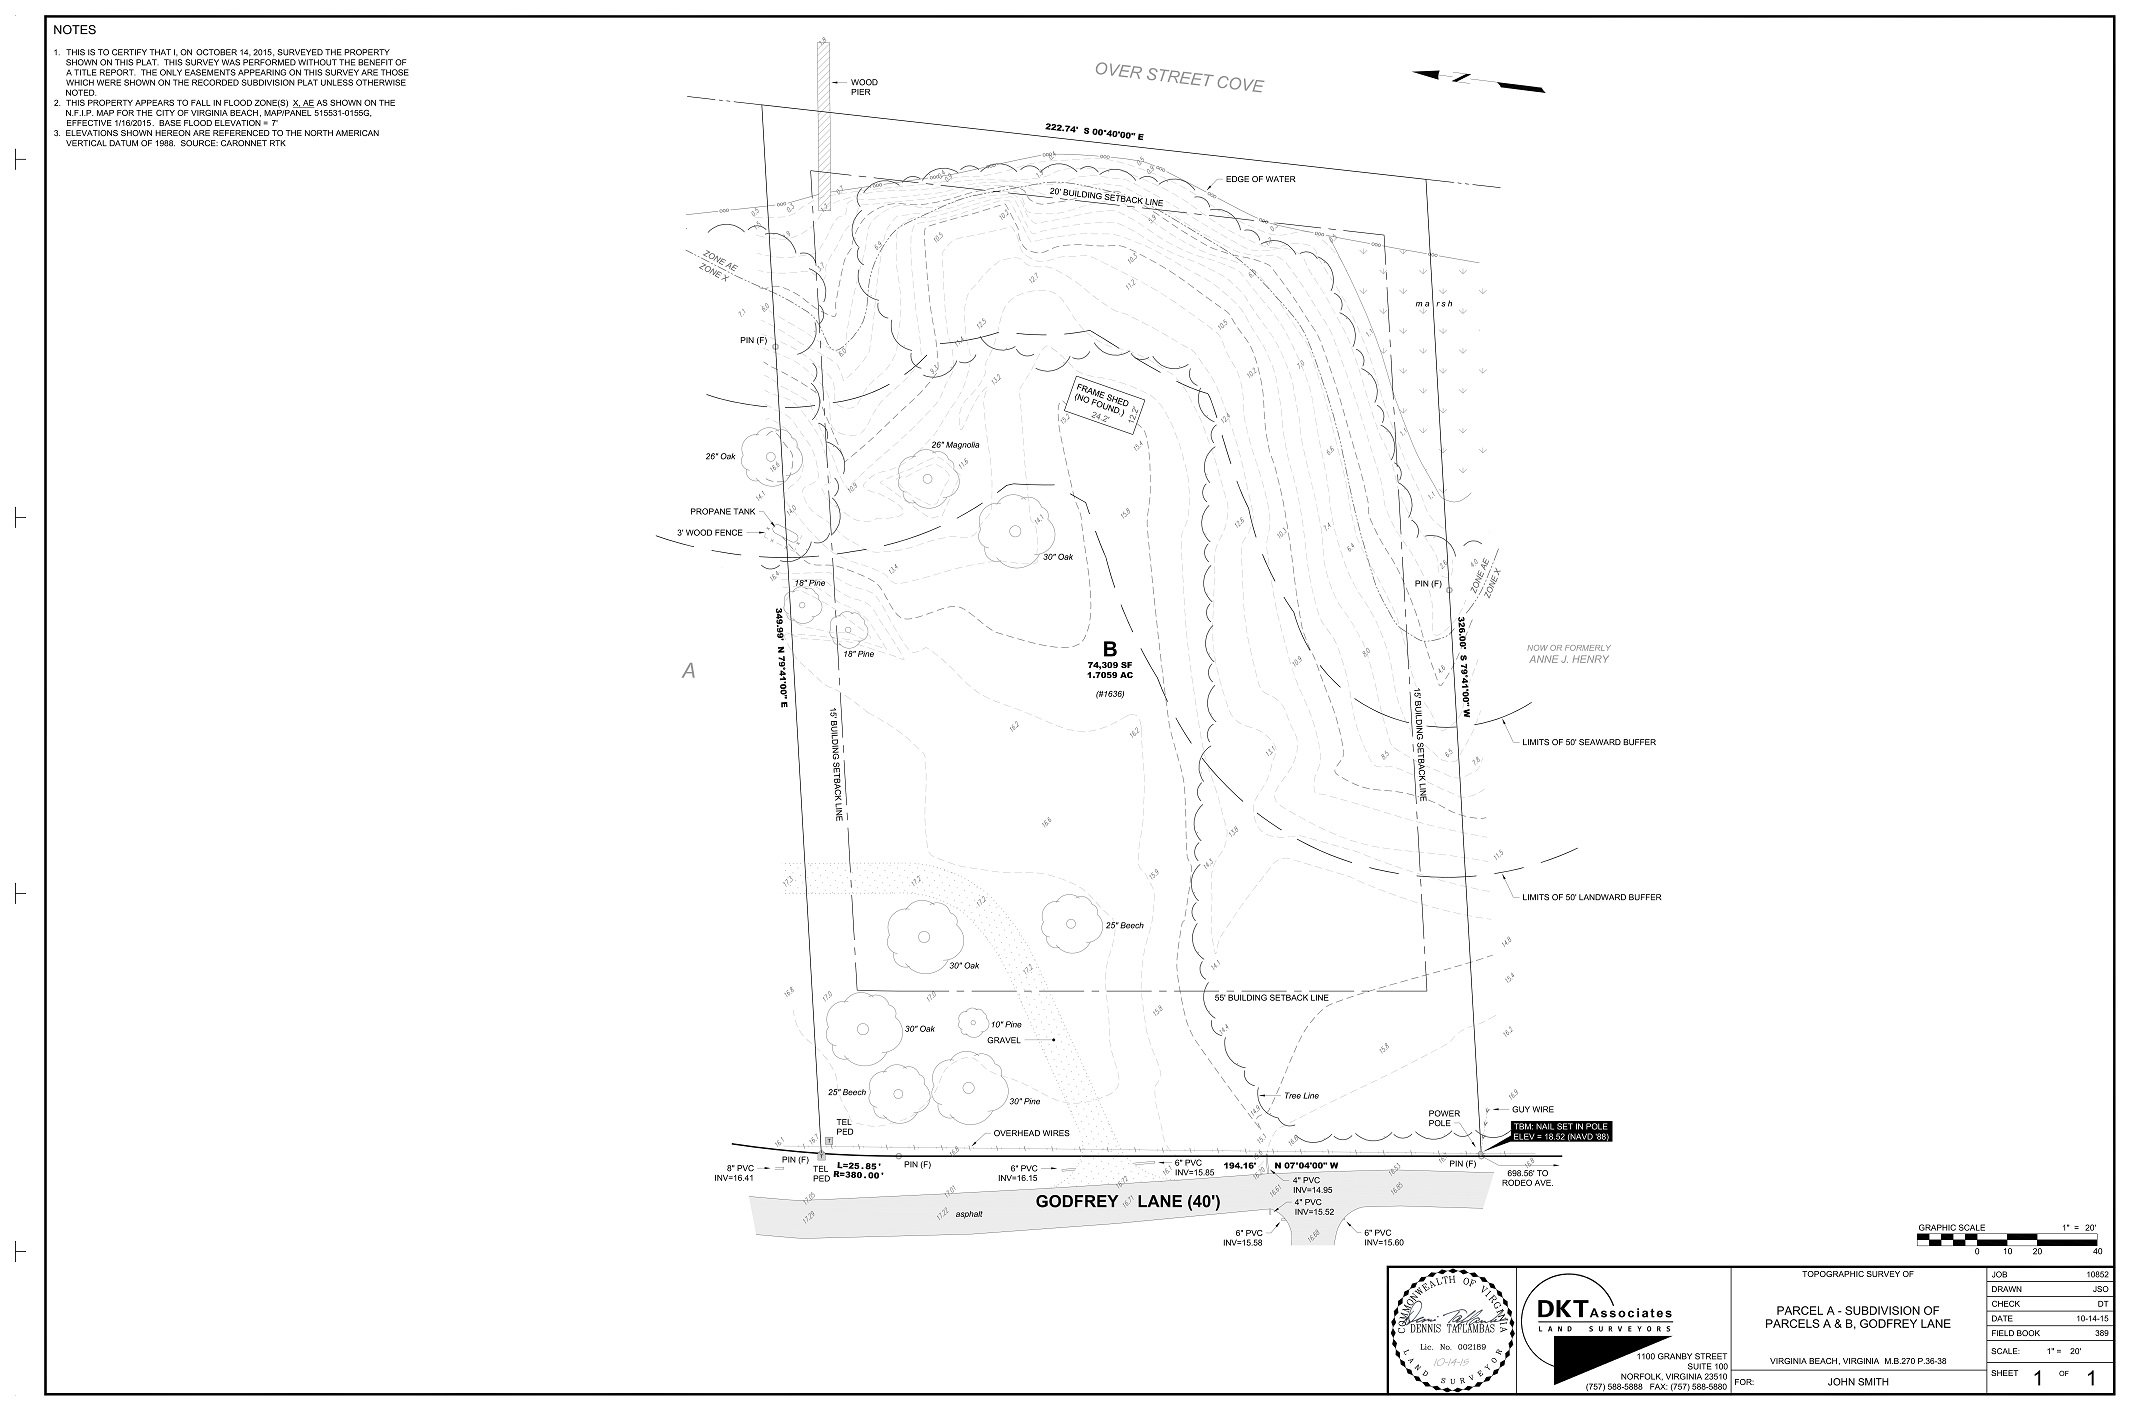 2131x1411 Dkt Associates Topographic Survey